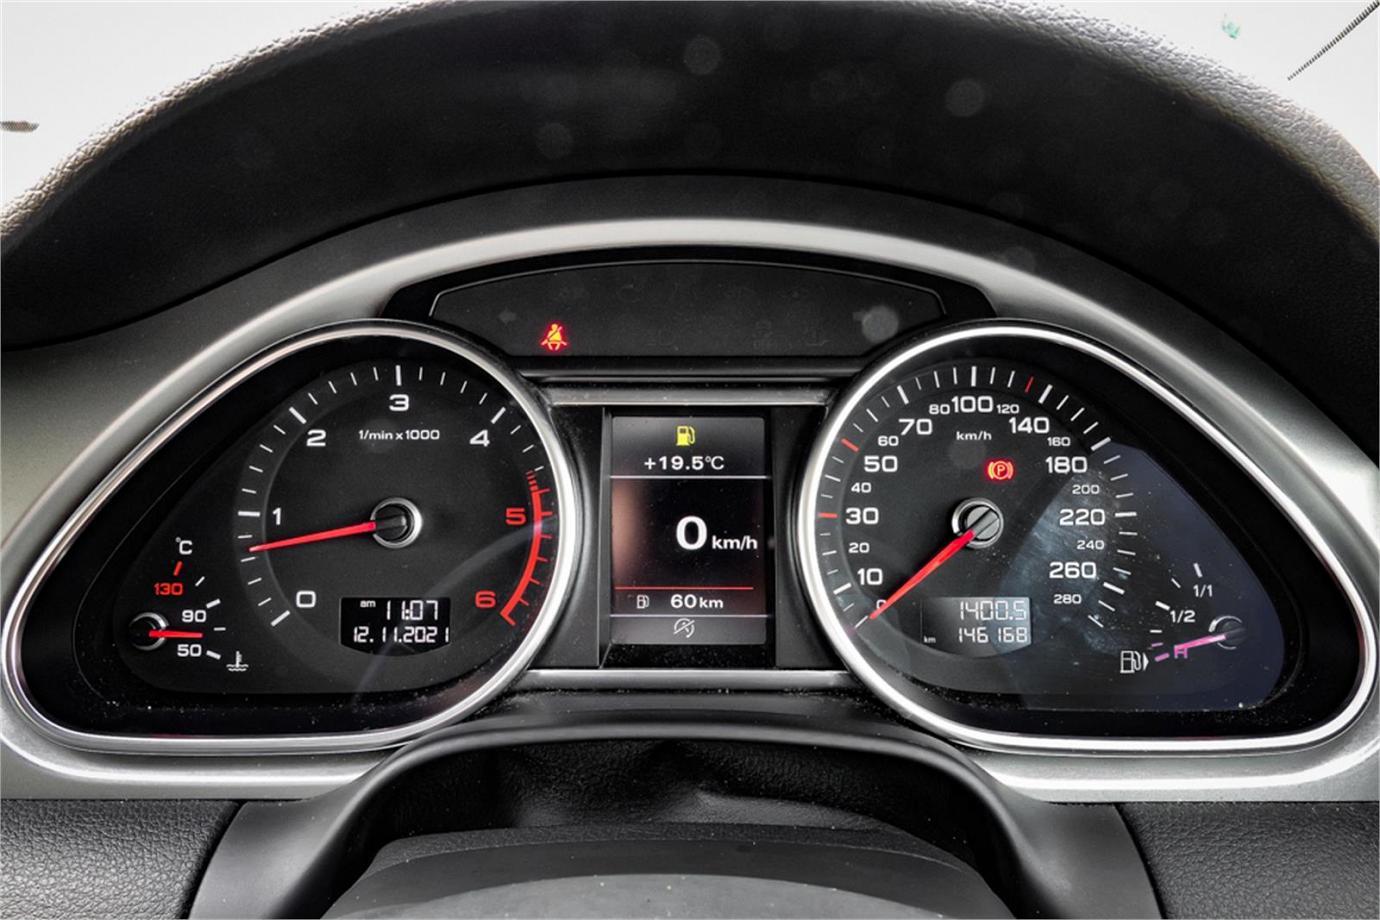 2014 Audi Q7 4L MY15 TDI. Wagon 7st 5dr Tiptronic 8sp quattro 3.0DT